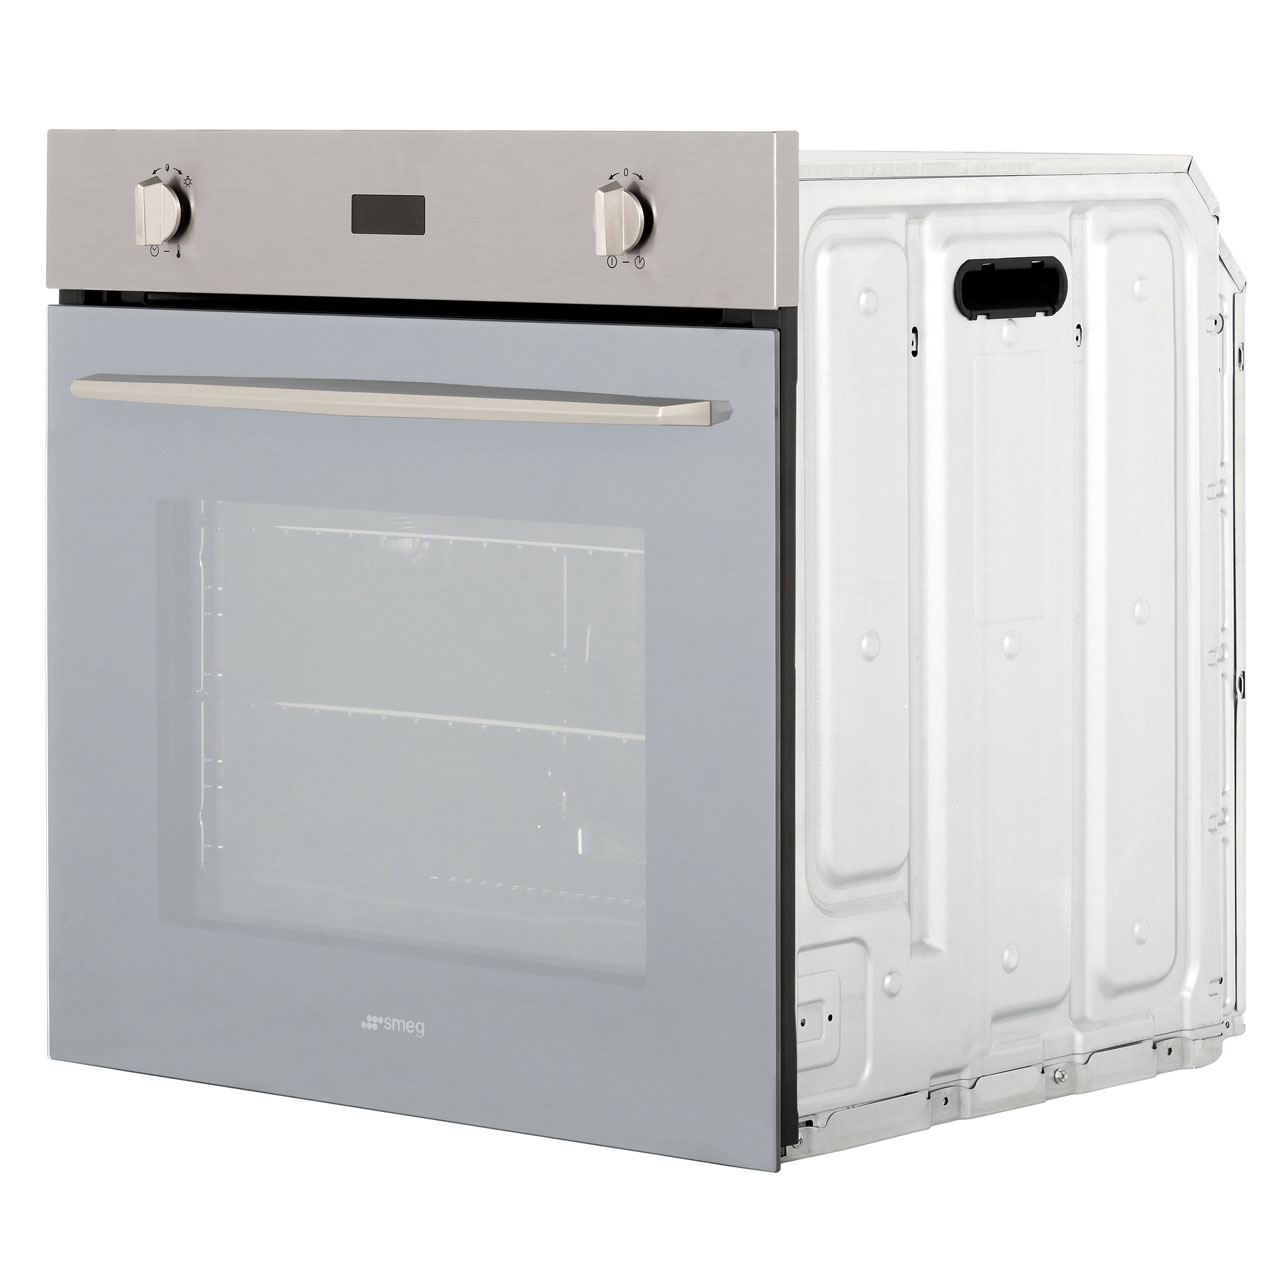 Smeg Home Appliances